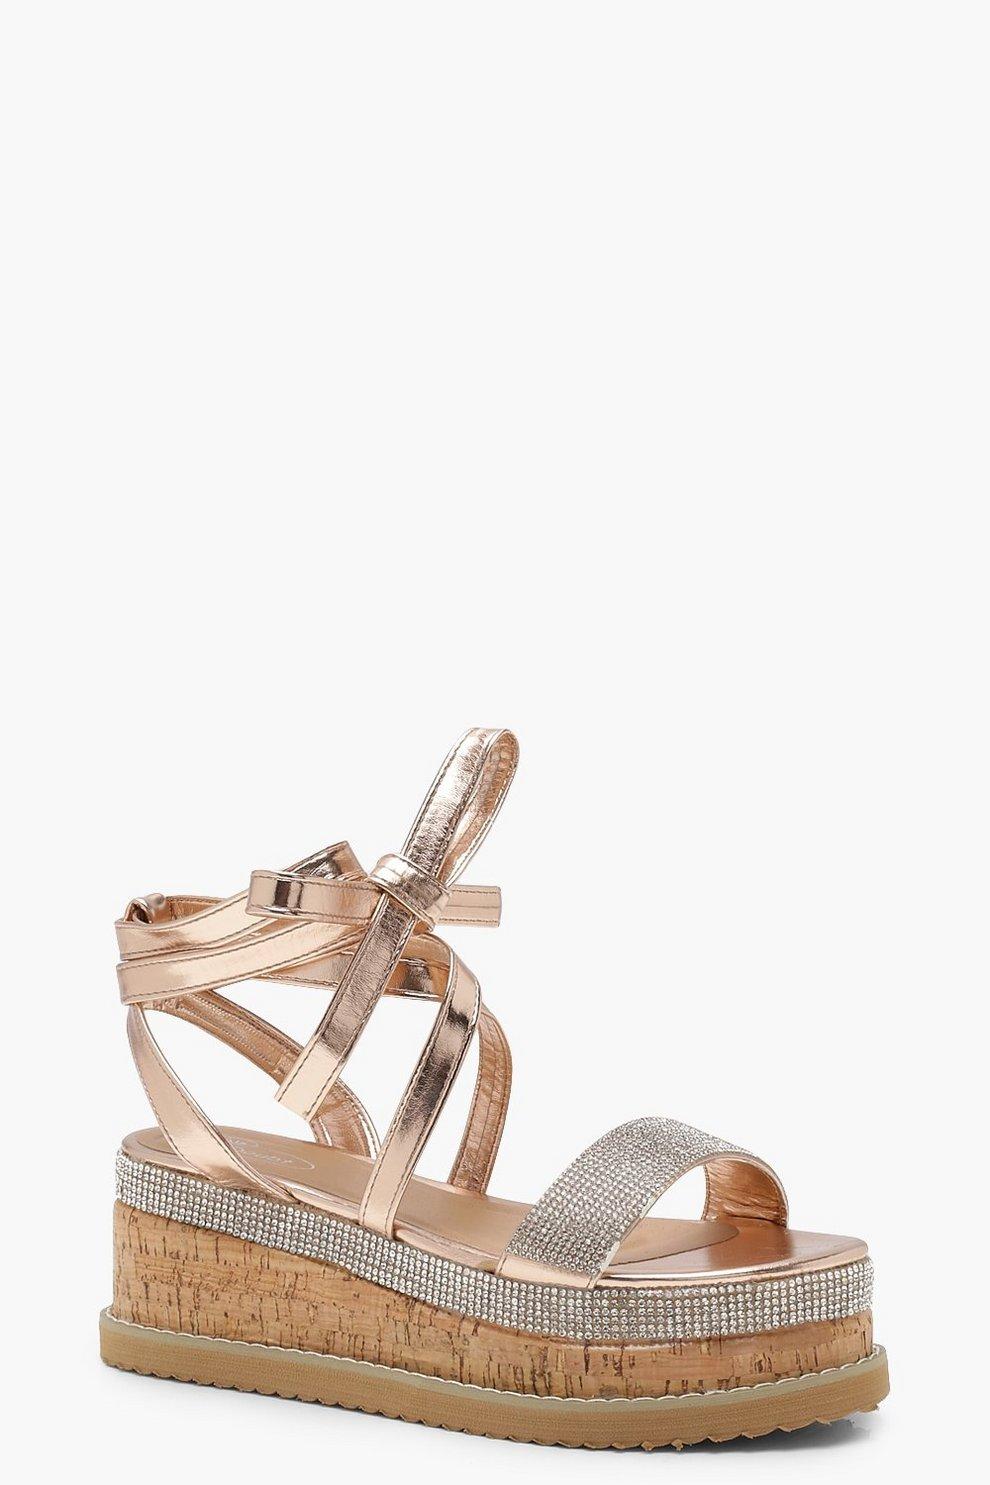 9d47722f13ec Womens Rose gold Tia Diamante Flatform Espadrille Tie Up Sandals